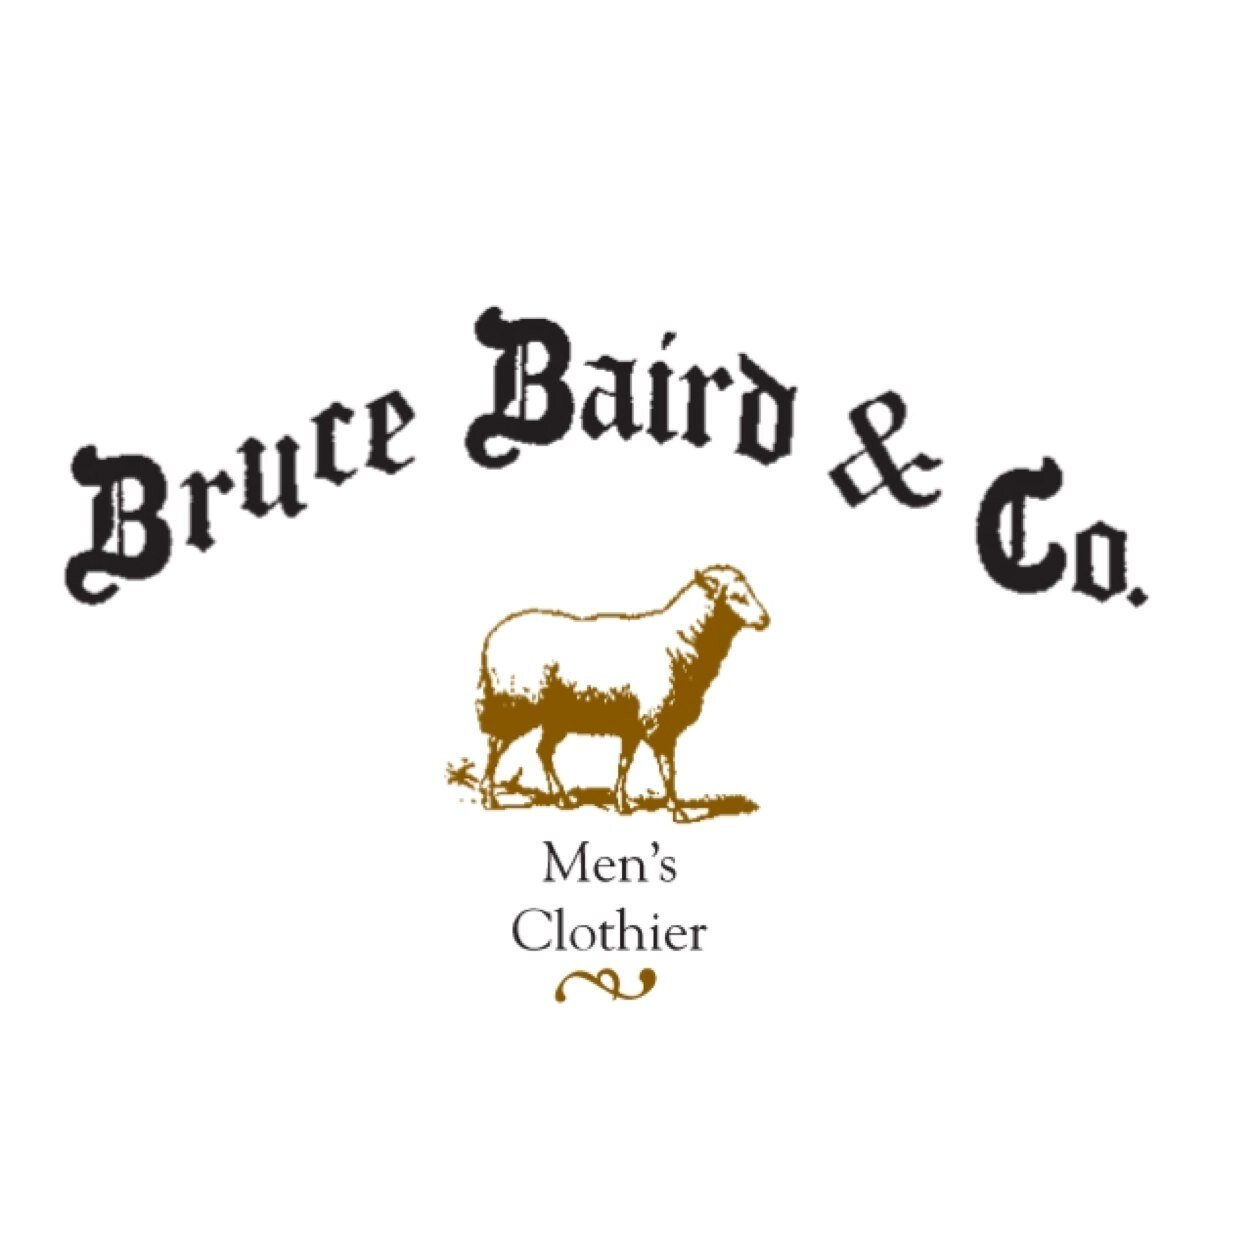 Bruce Baird and Co  (@BruceBairdCo)   Twitter